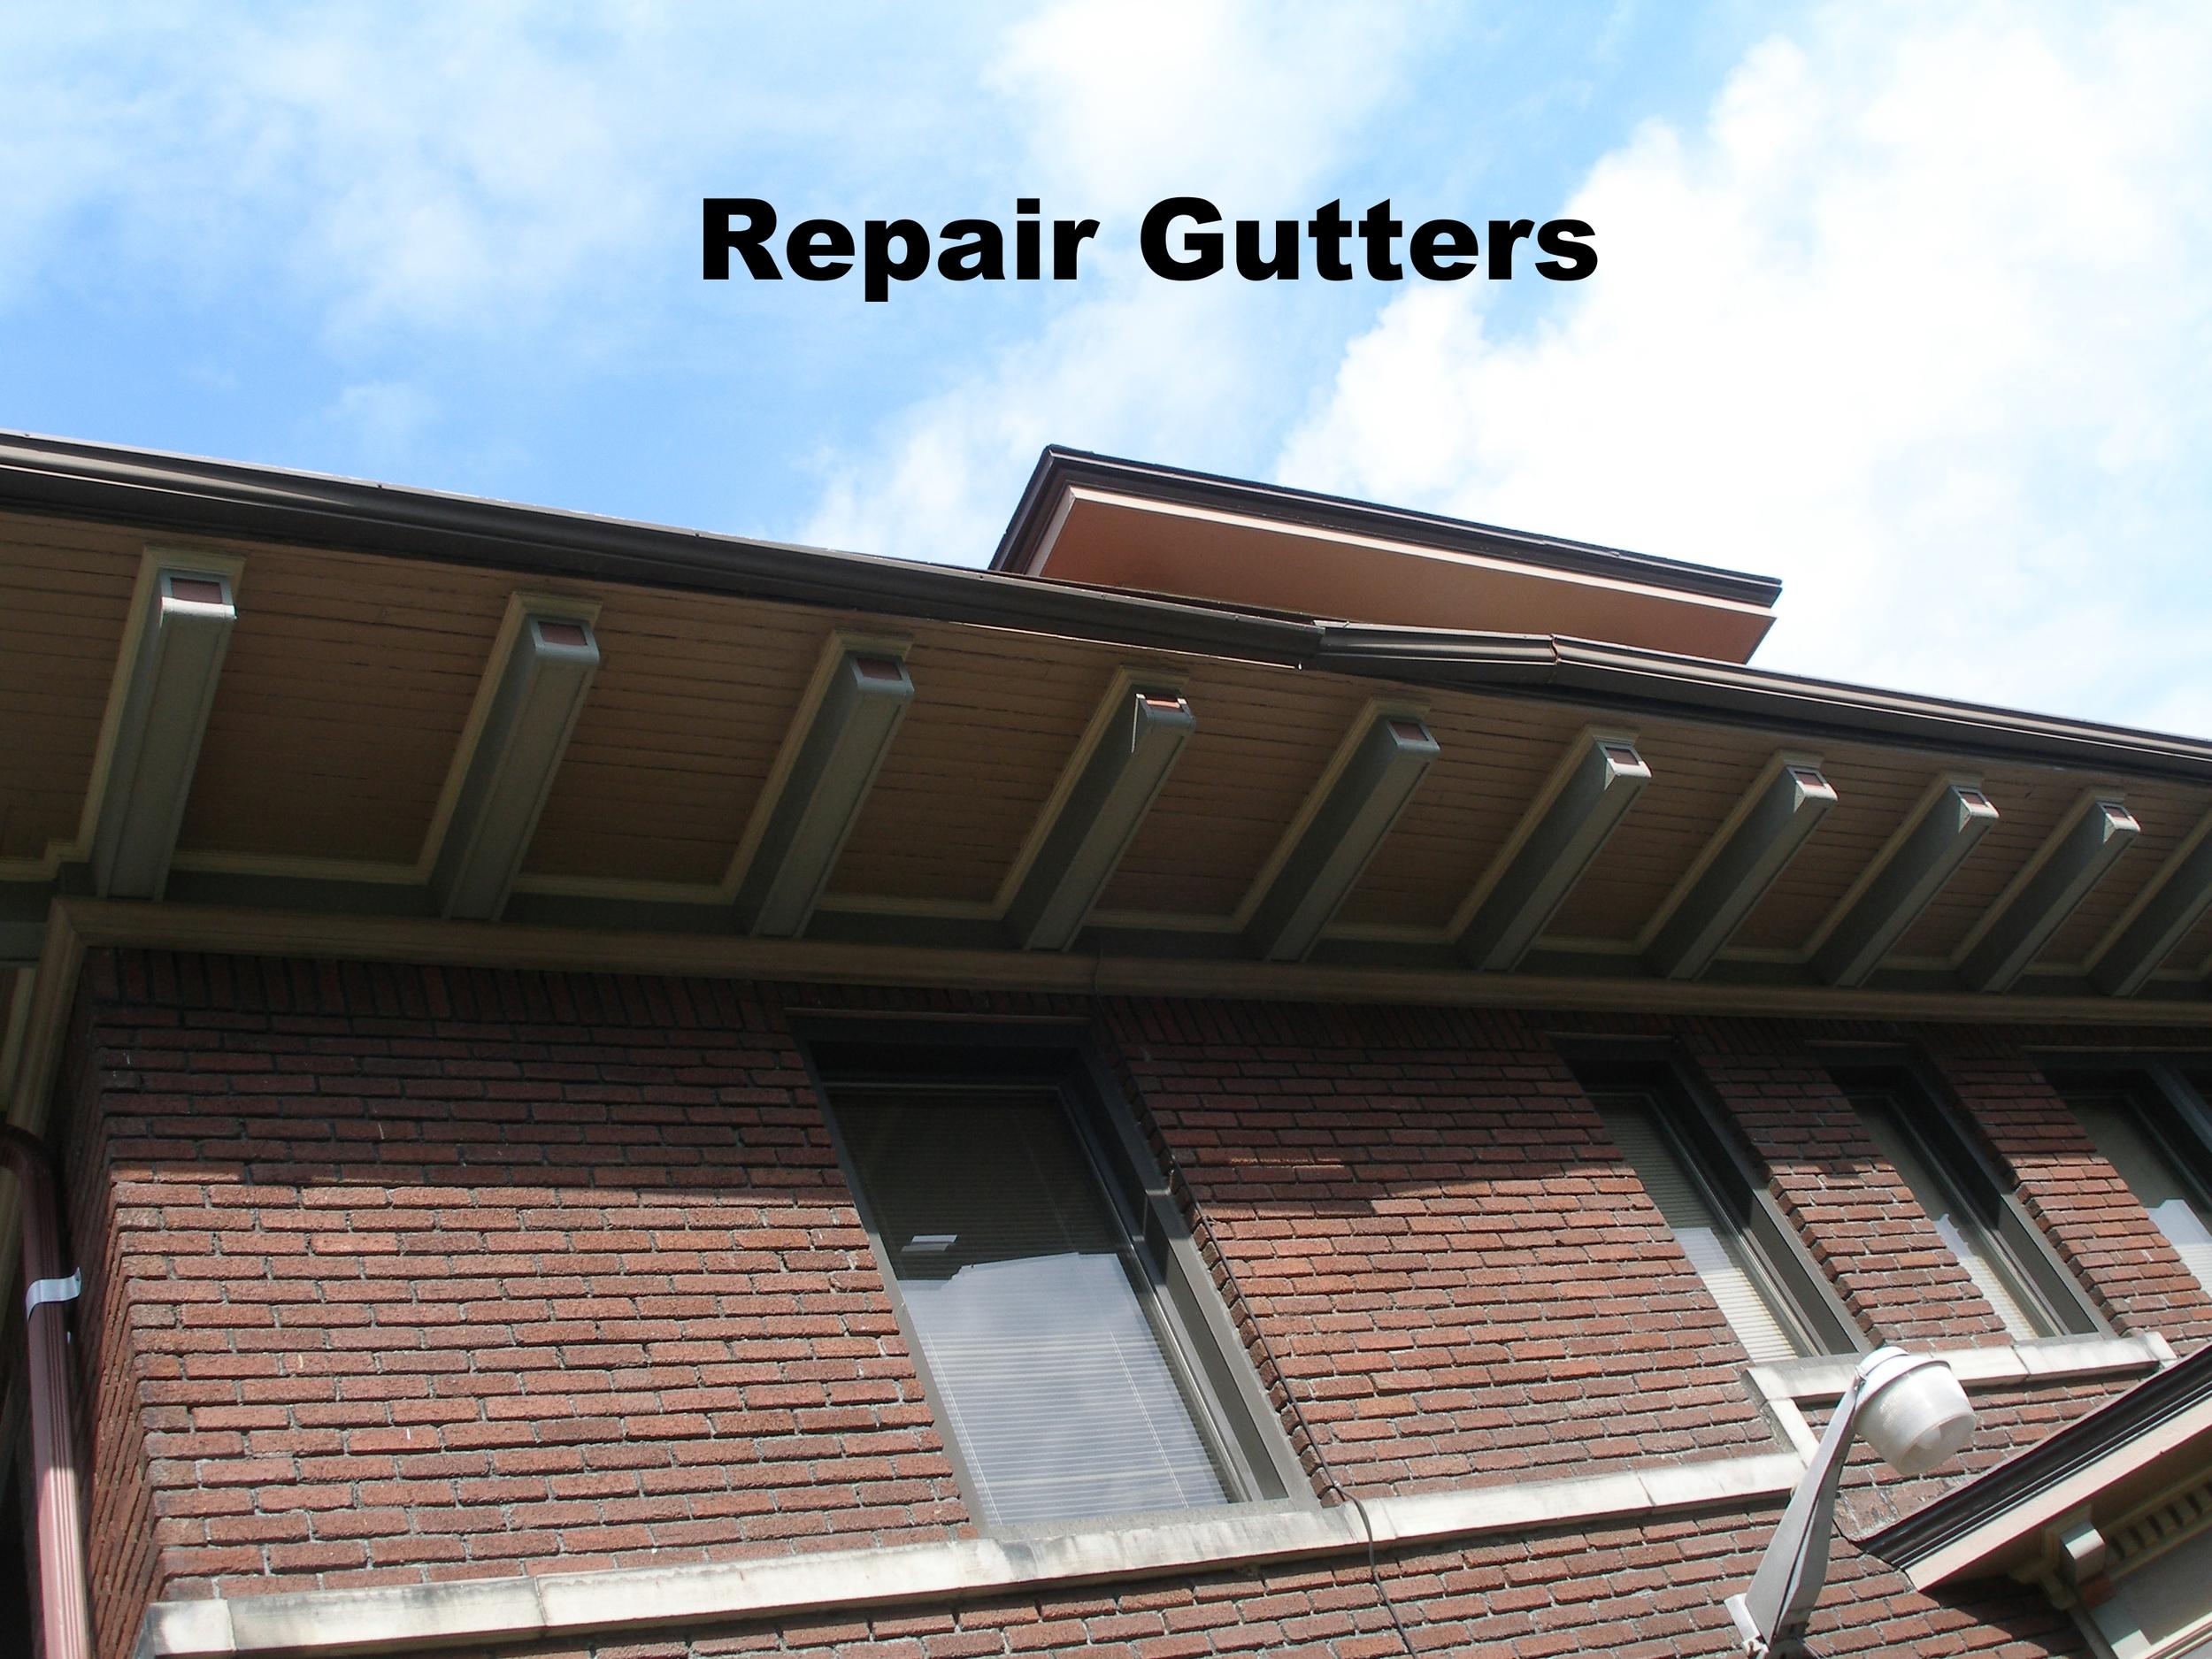 Red Cross gutter repair - Copy.jpg